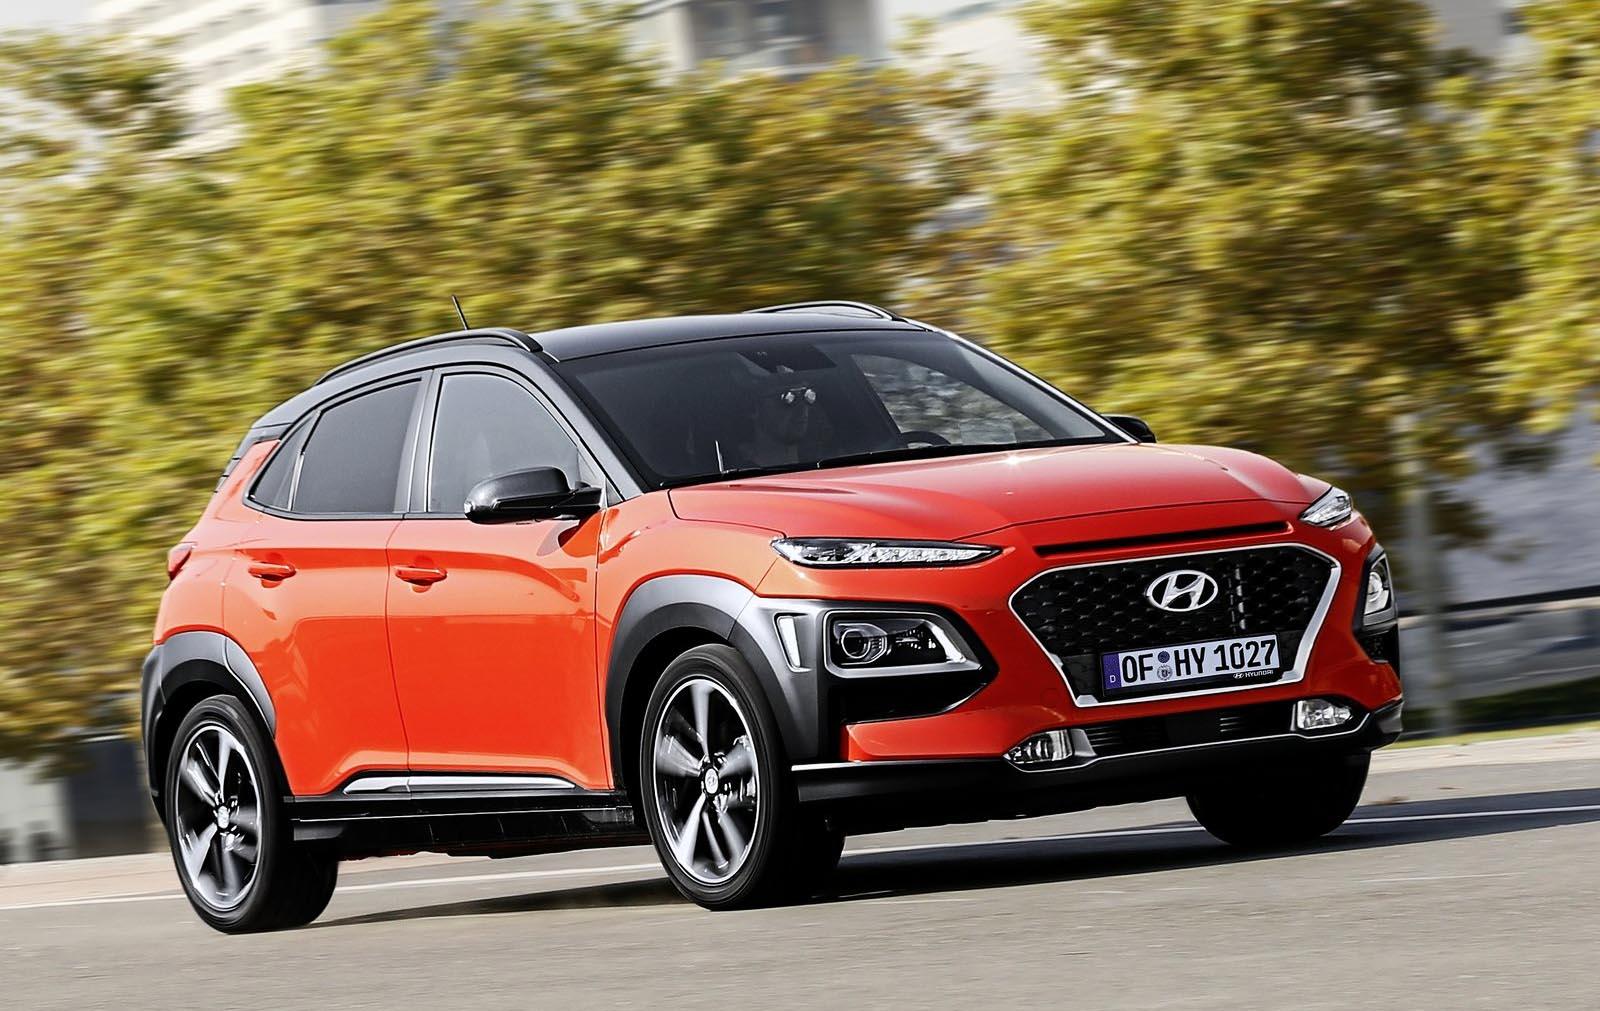 Photo of Νέο Hyundai Κona: Ανατρέπει τα δεδομένα!